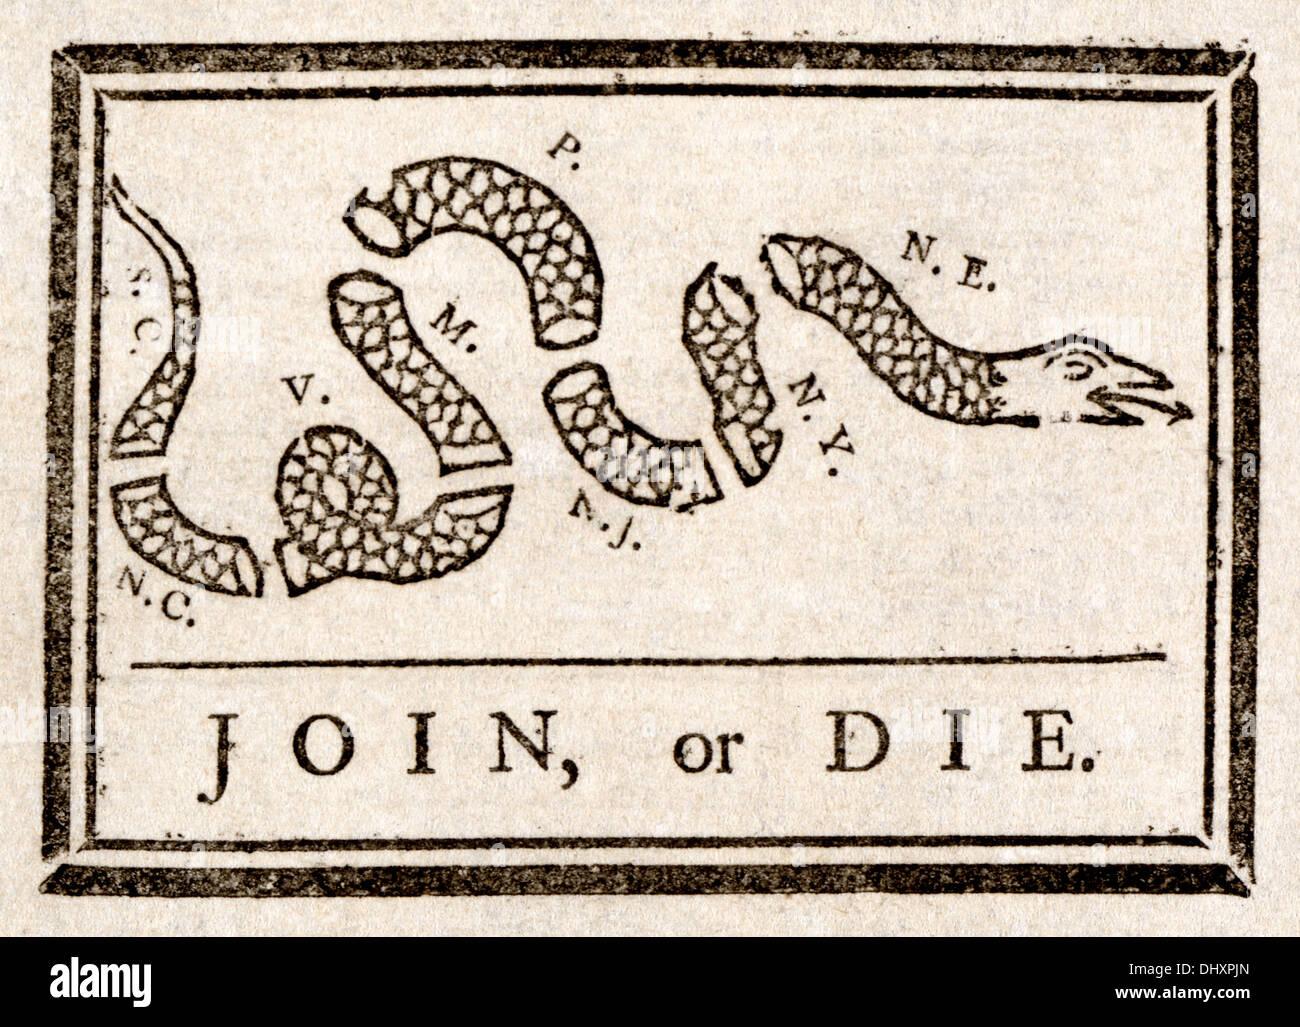 Join, or Die - by Benjamin Franklin, 1754 - Stock Image